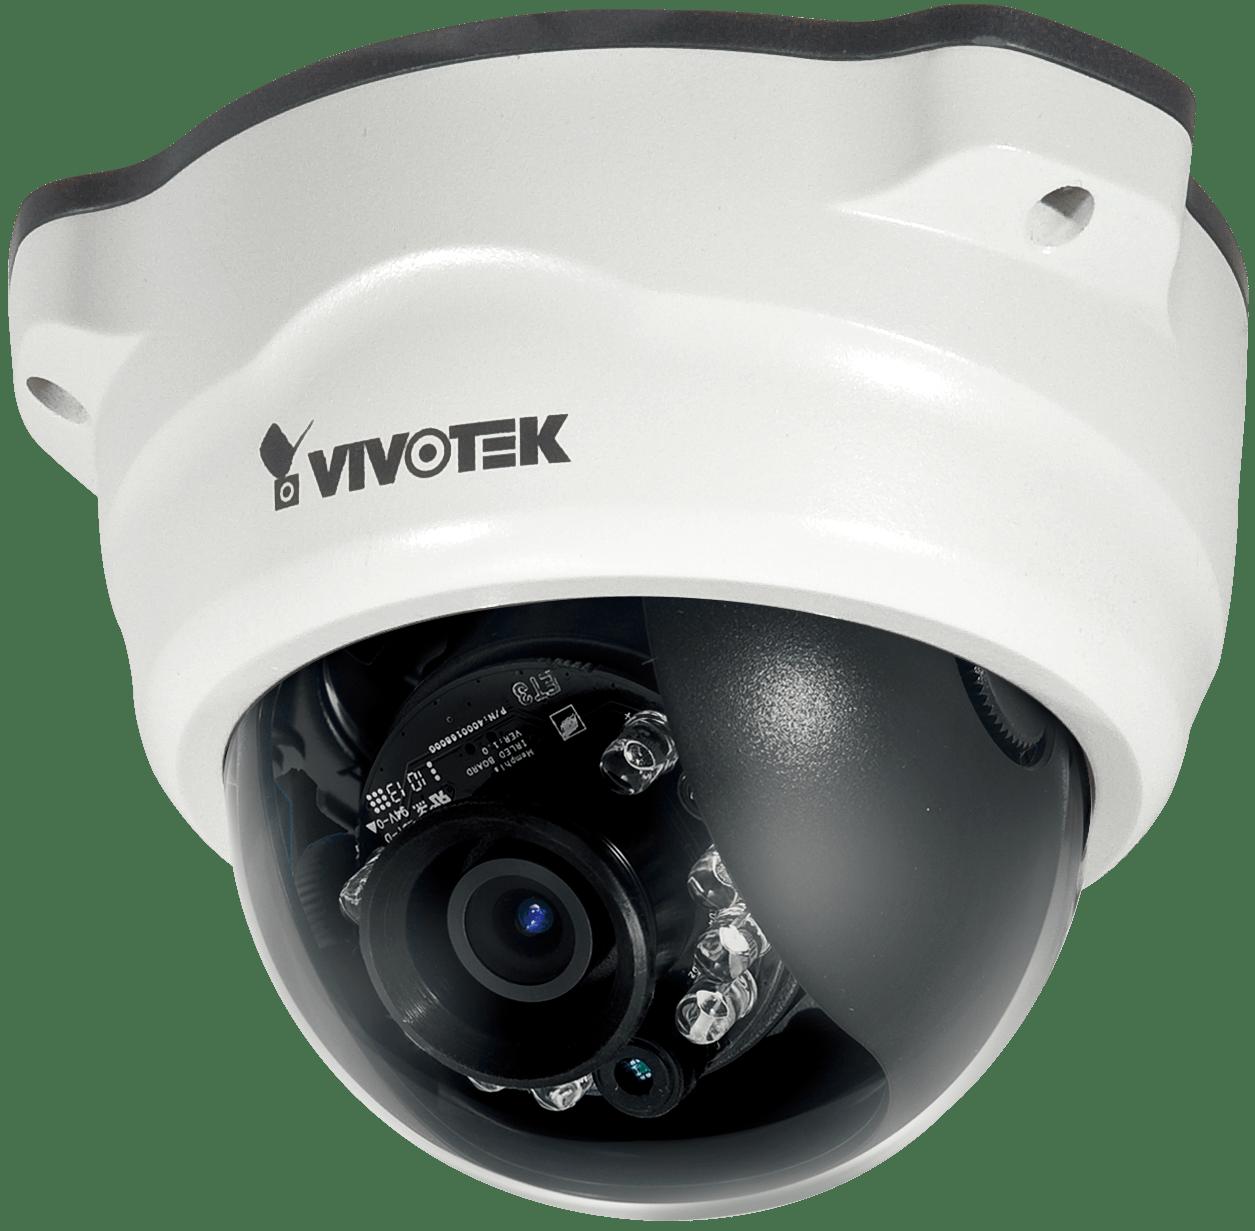 Fd8134v Vivotek Dome Network Camera H264 Vandal Proof Ip66 Wiring Diagram Furthermore Security Download